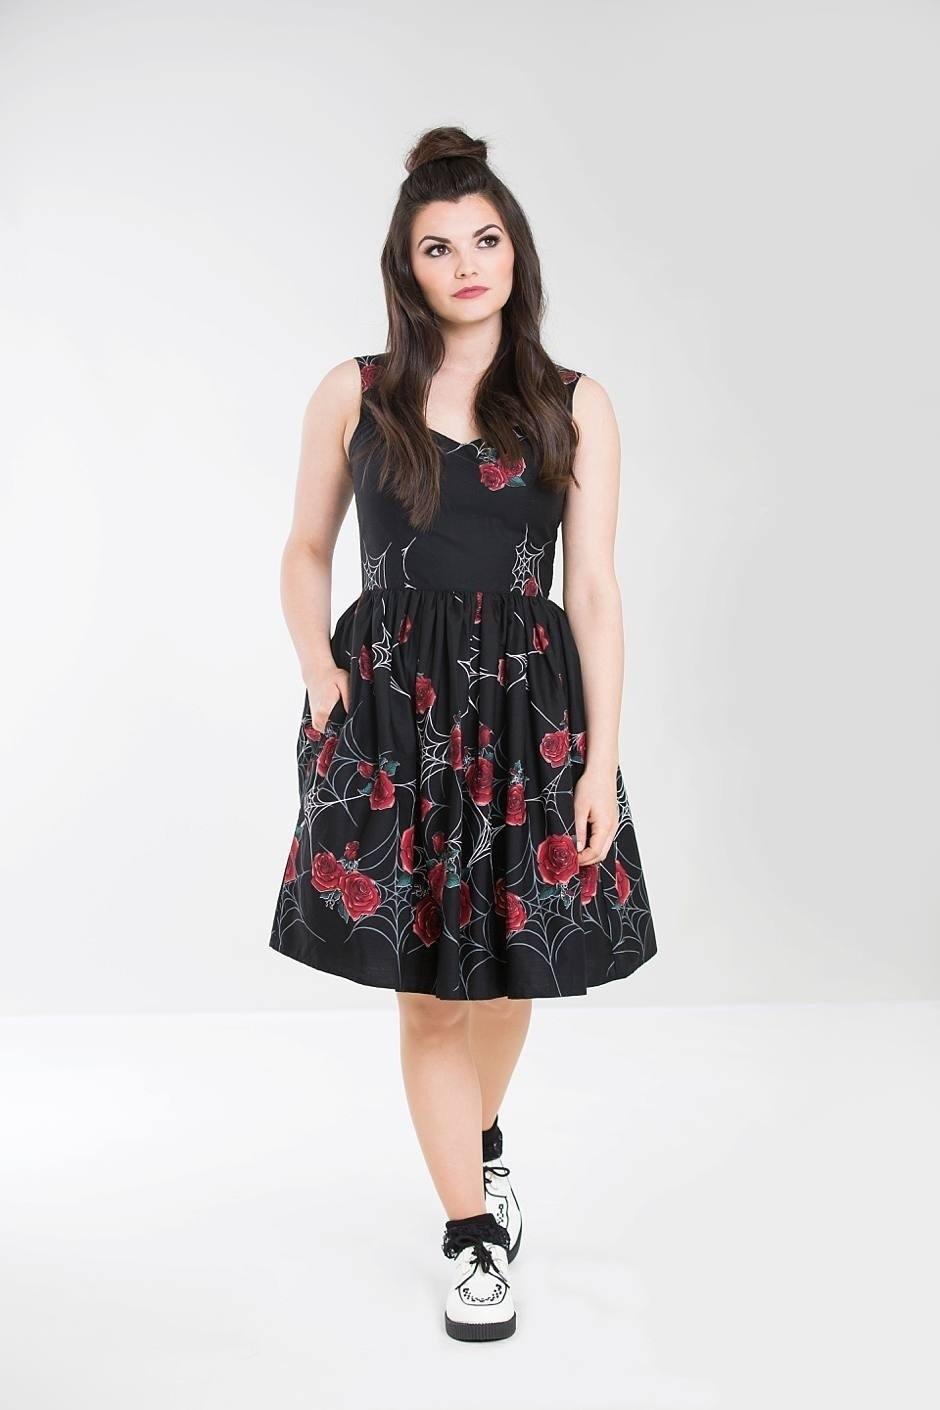 Jurk Sabrina 50s met rode rozen en spinneweb